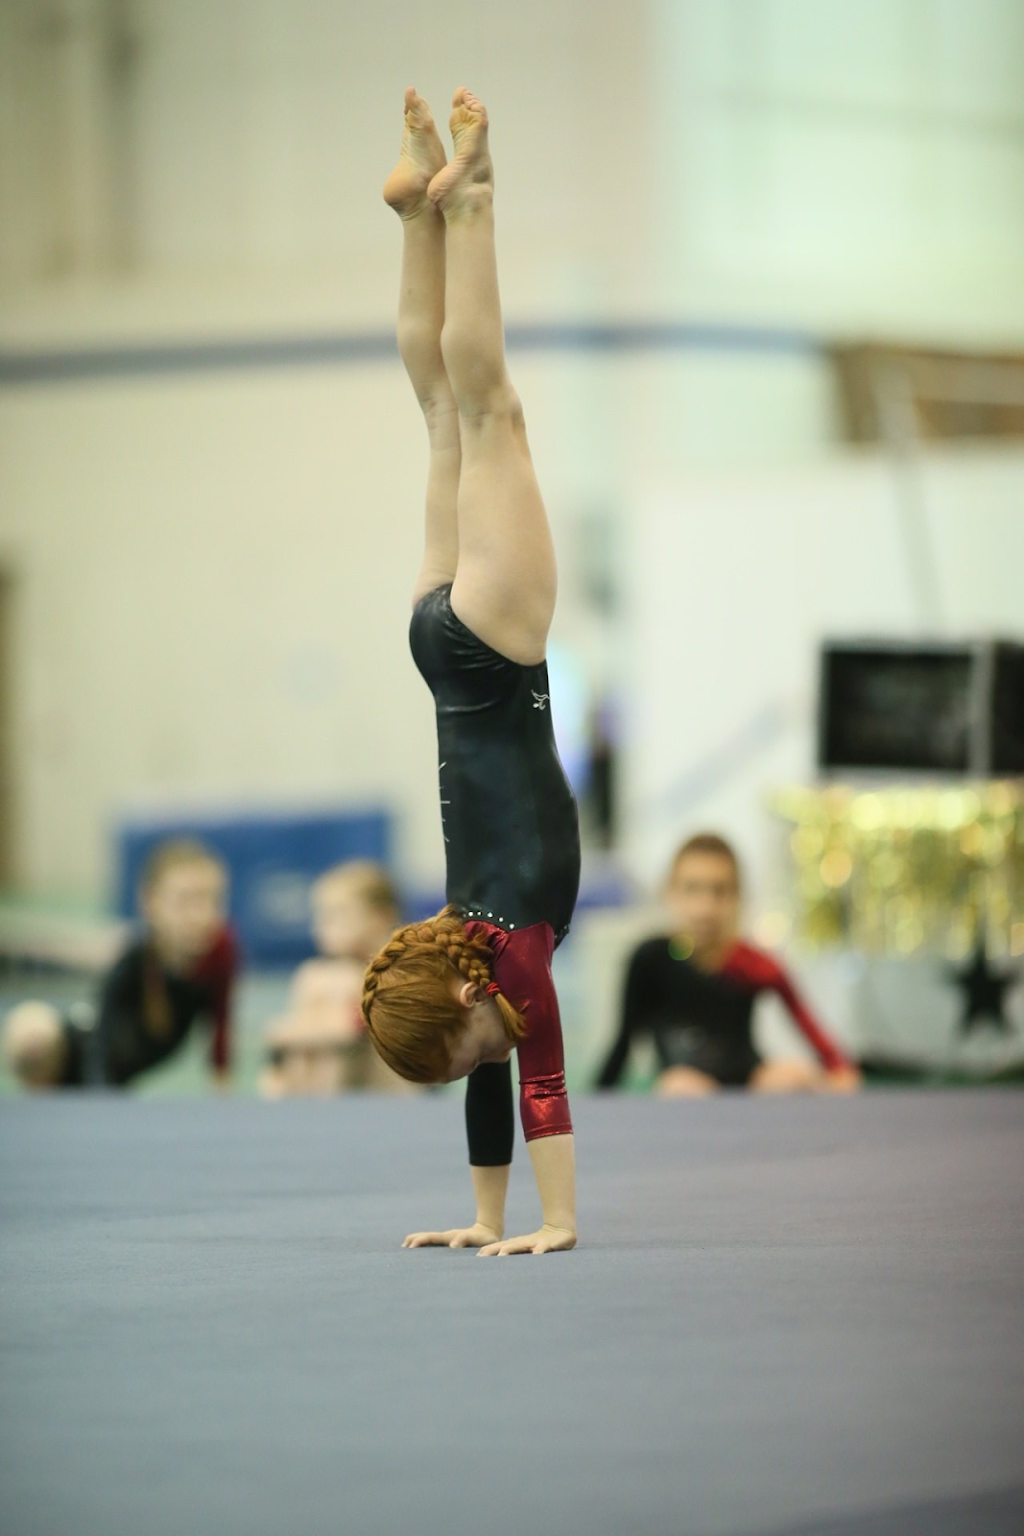 Suffield Gymnastics Academy - gym  | Photo 9 of 10 | Address: 110A Ffyler Pl, Suffield, CT 06078, USA | Phone: (860) 936-1833